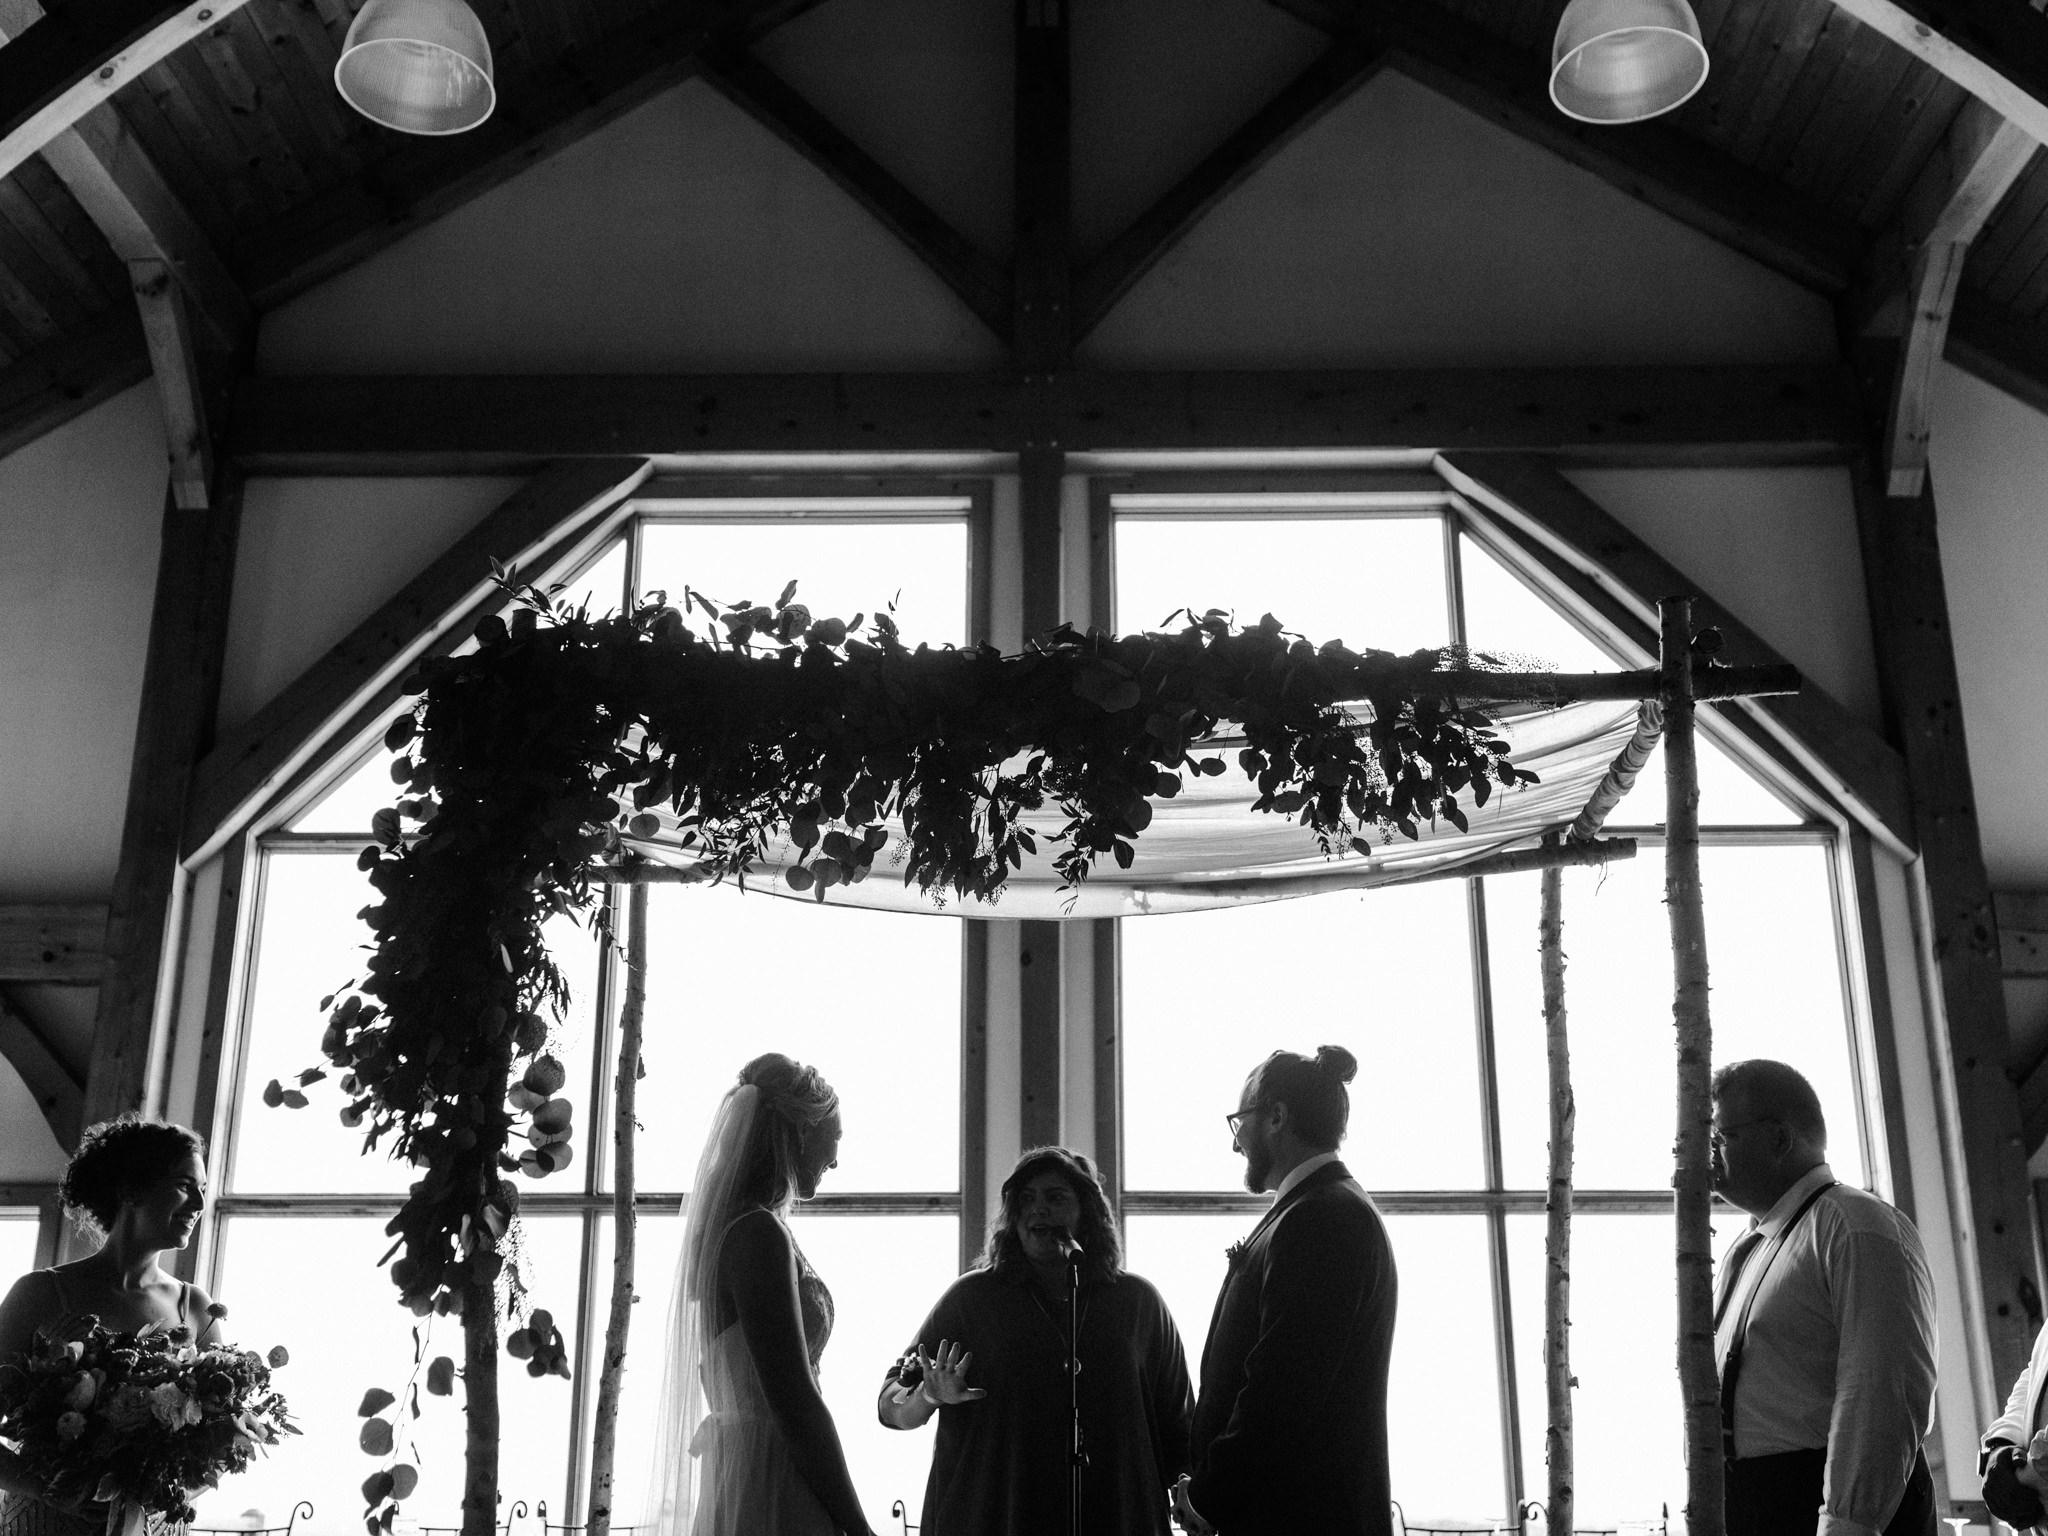 skyloft-wedding-toronto-wedding-photographer-31.jpg